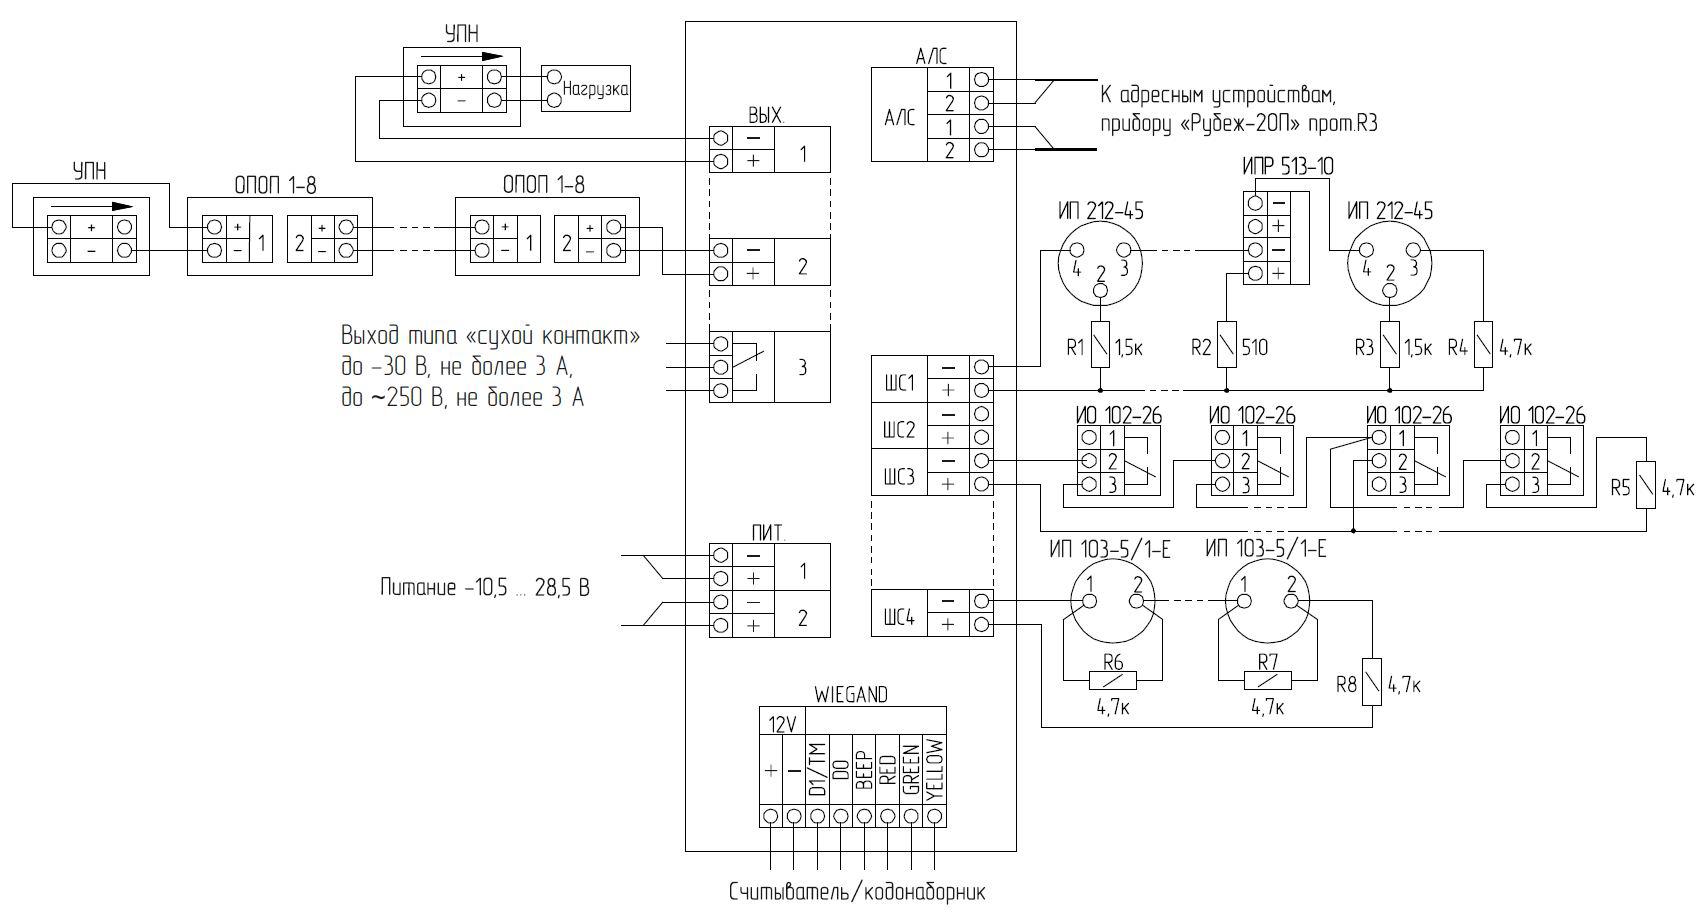 АМП-4 протокол R3 метка адресная пожарная